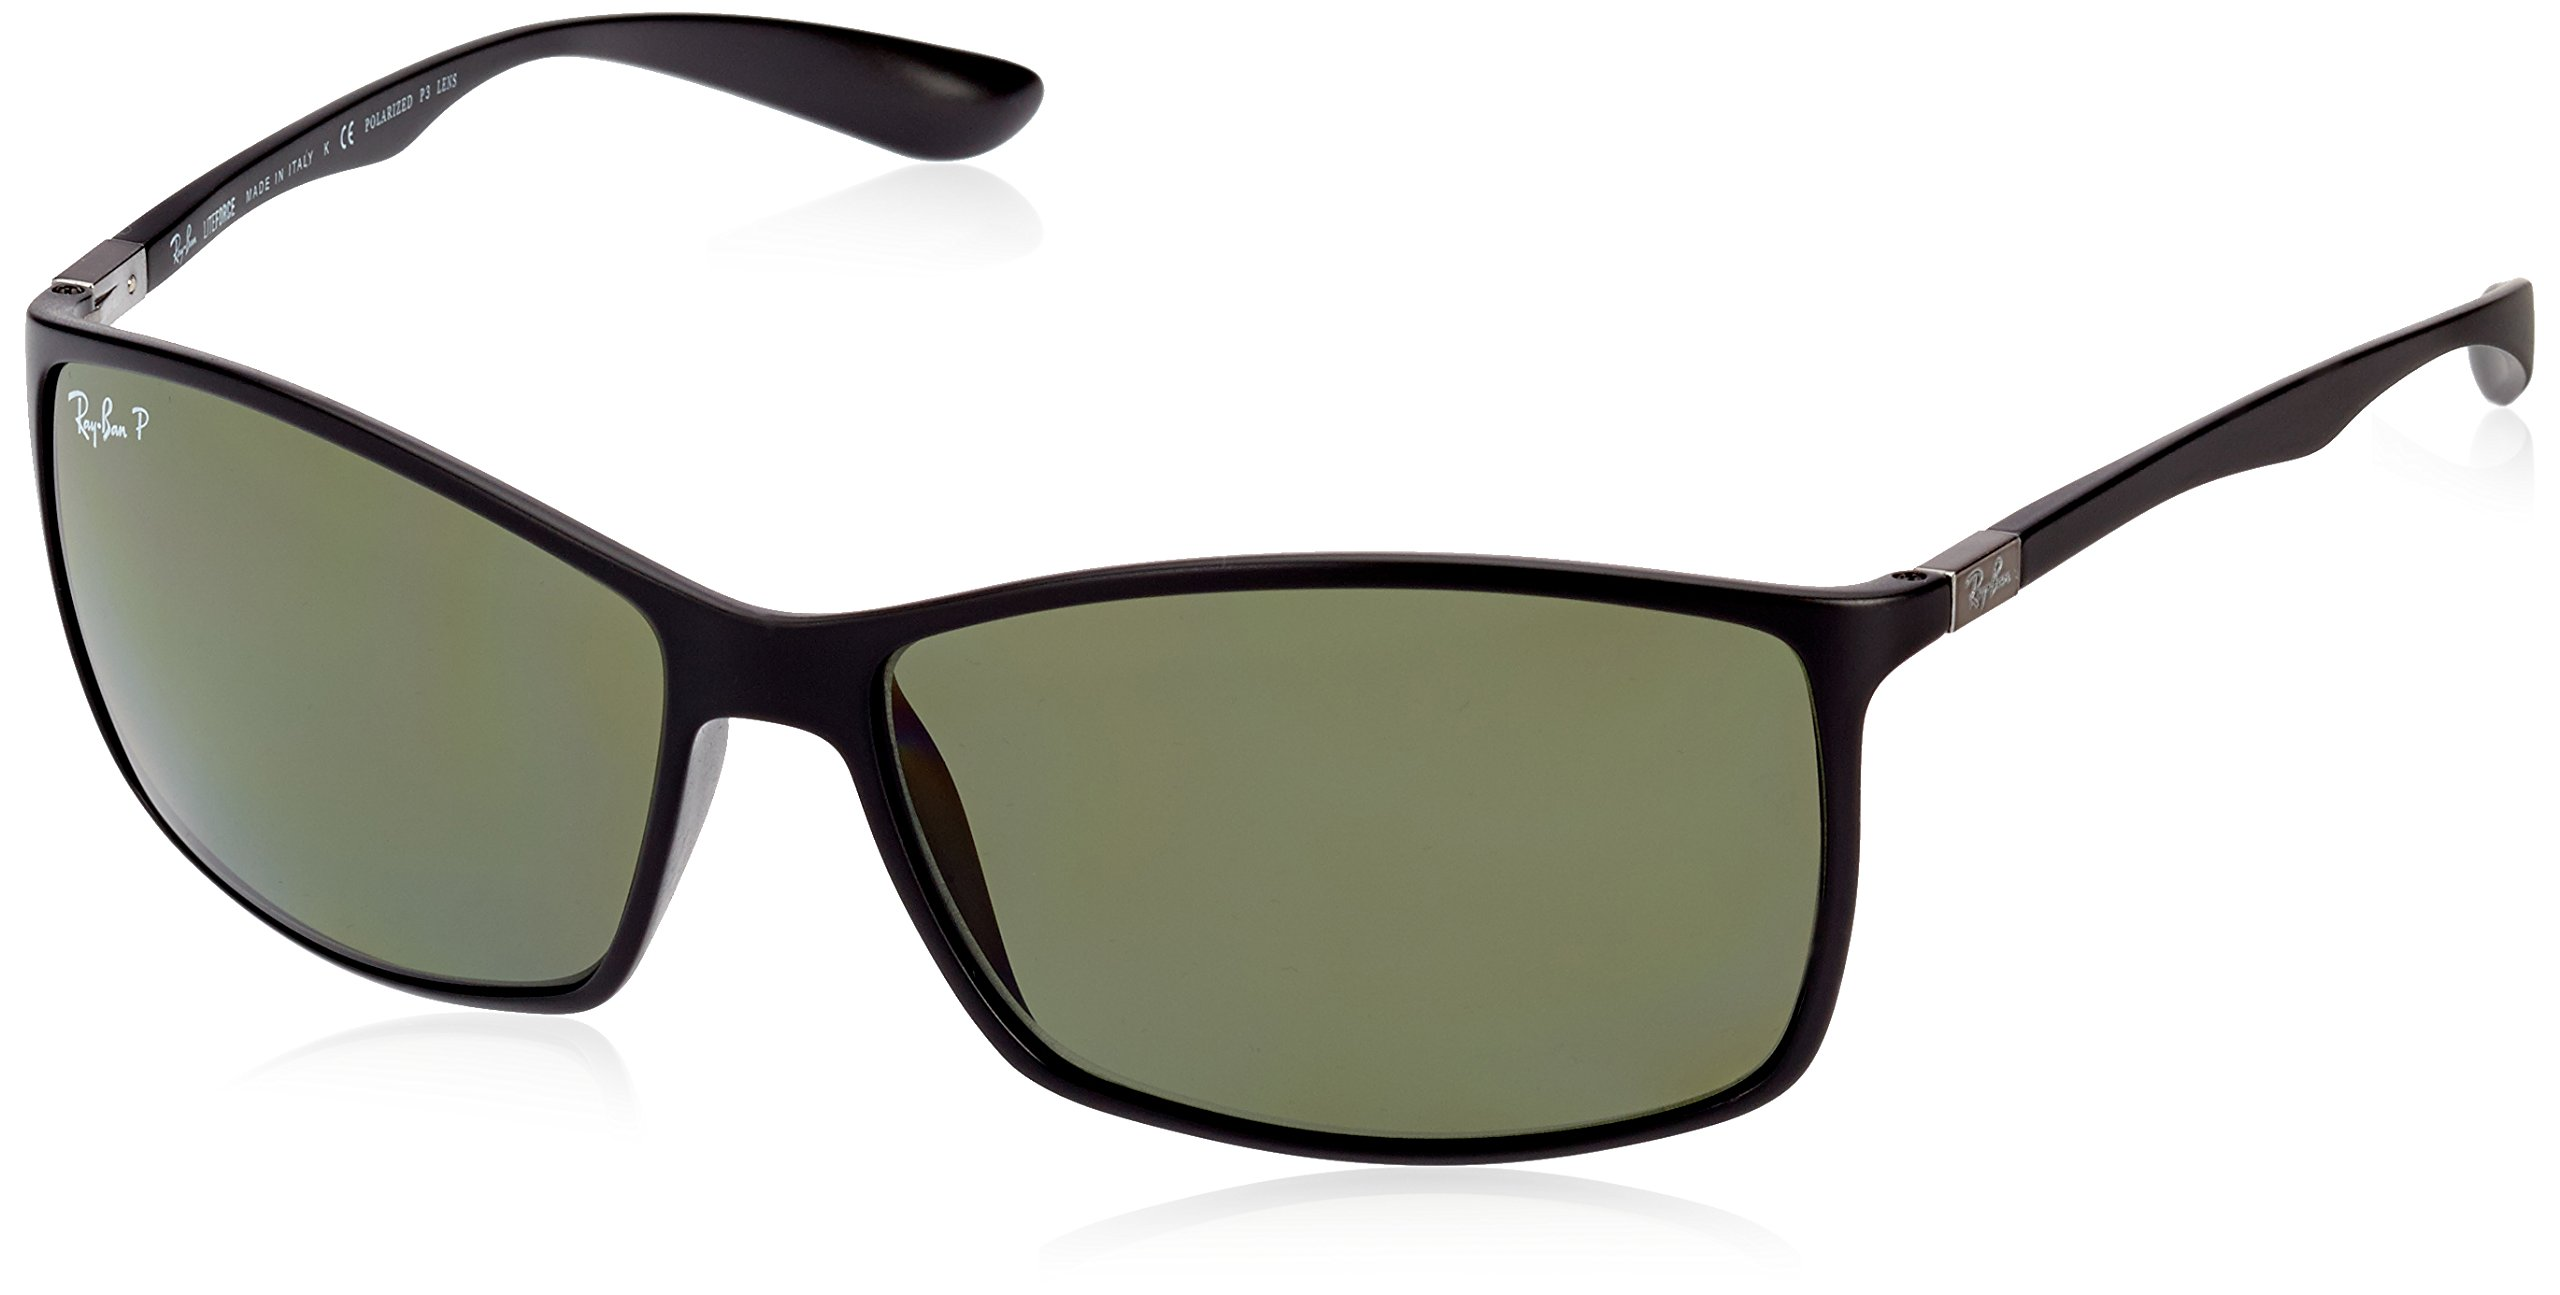 Ray-Ban Men's RB4179 Liteforce Square Sunglasses, Matte Black/Polarized Green, 62 mm